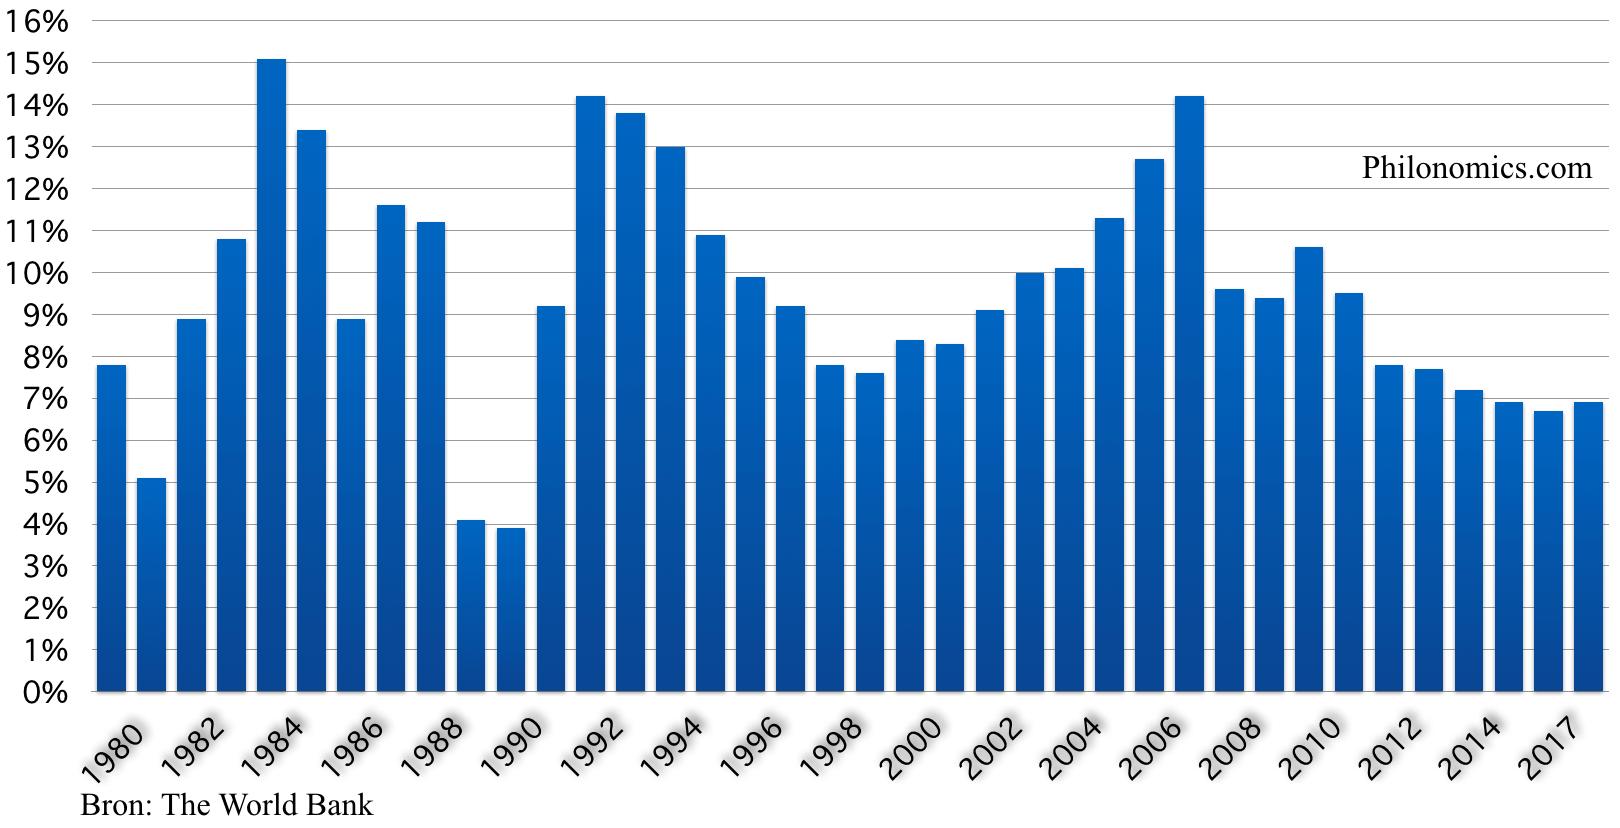 Chinese economische groei in % 1980 2018